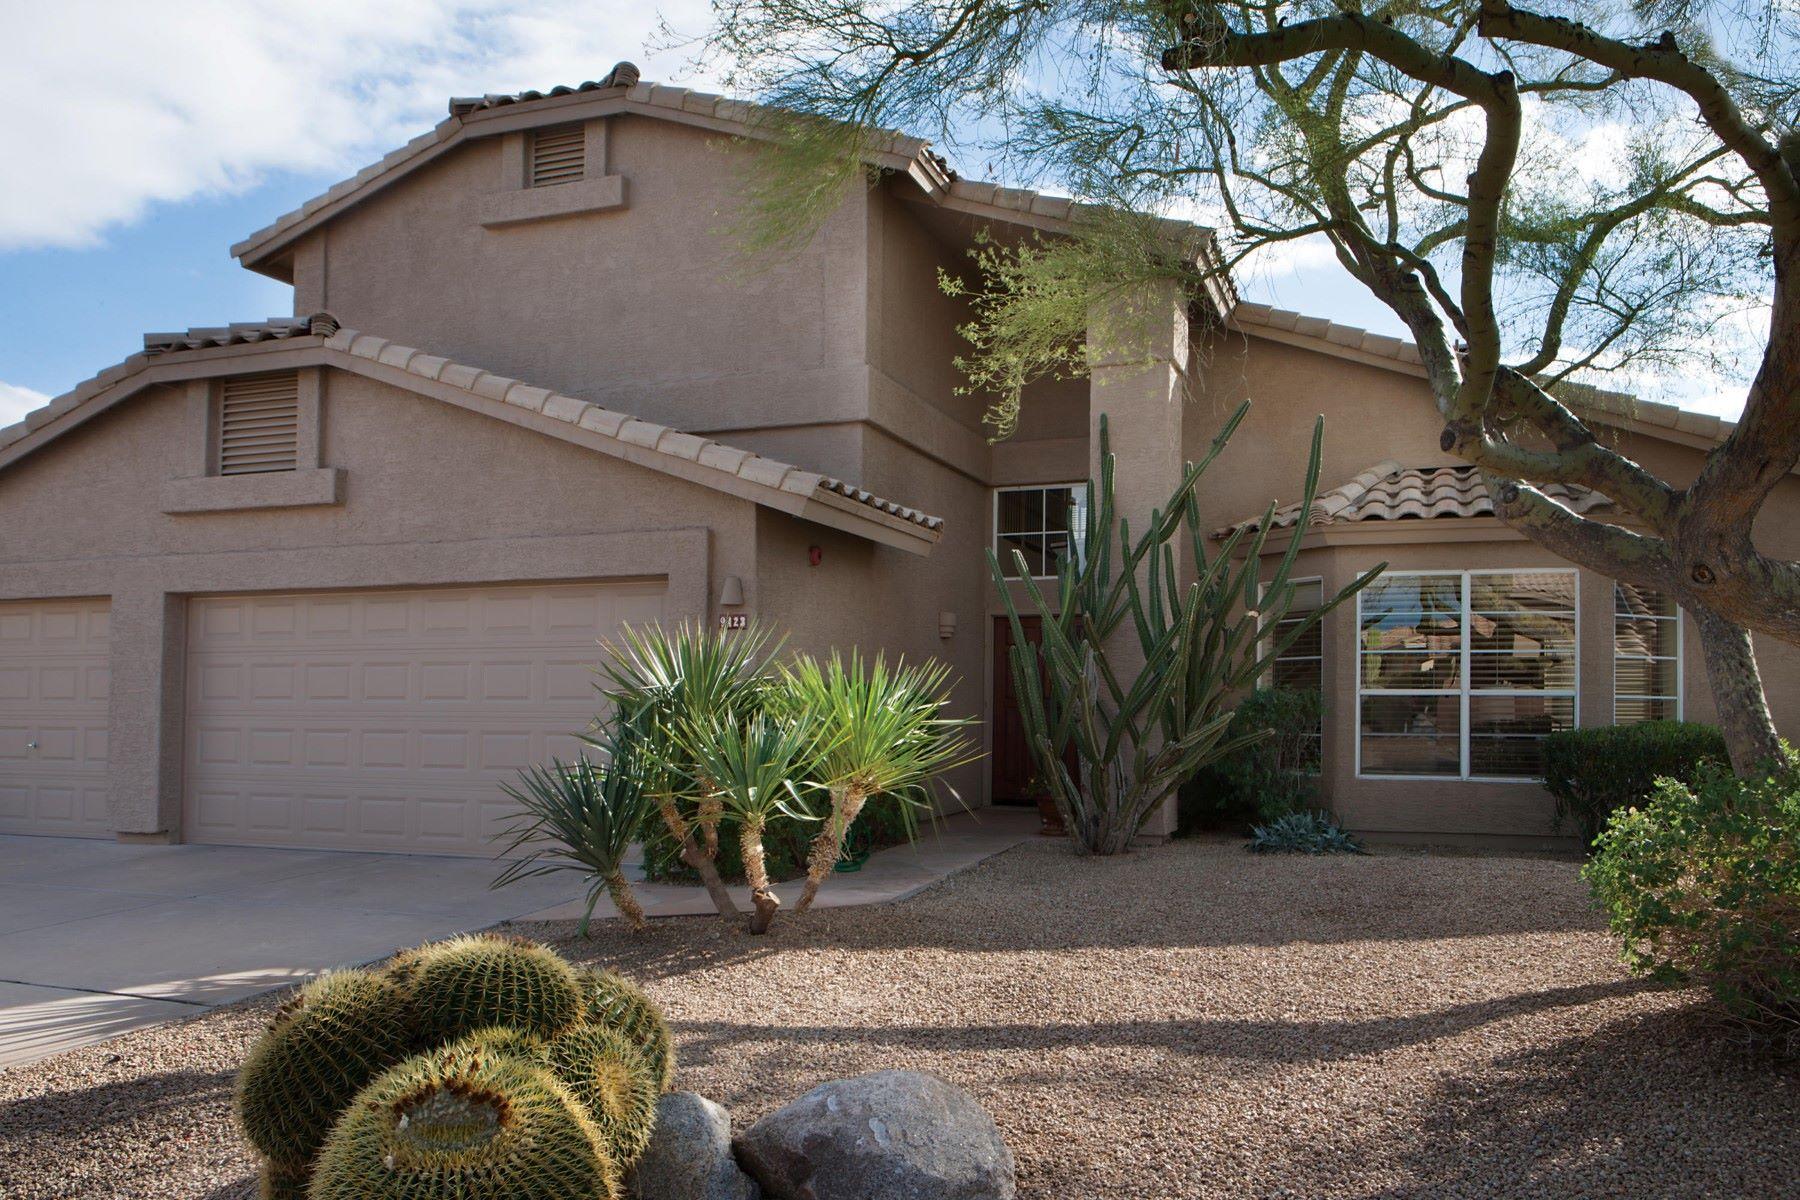 Villa per Vendita alle ore Immaculately maintained Ironwood Village 9423 E Rosemonte Dr Scottsdale, Arizona, 85255 Stati Uniti